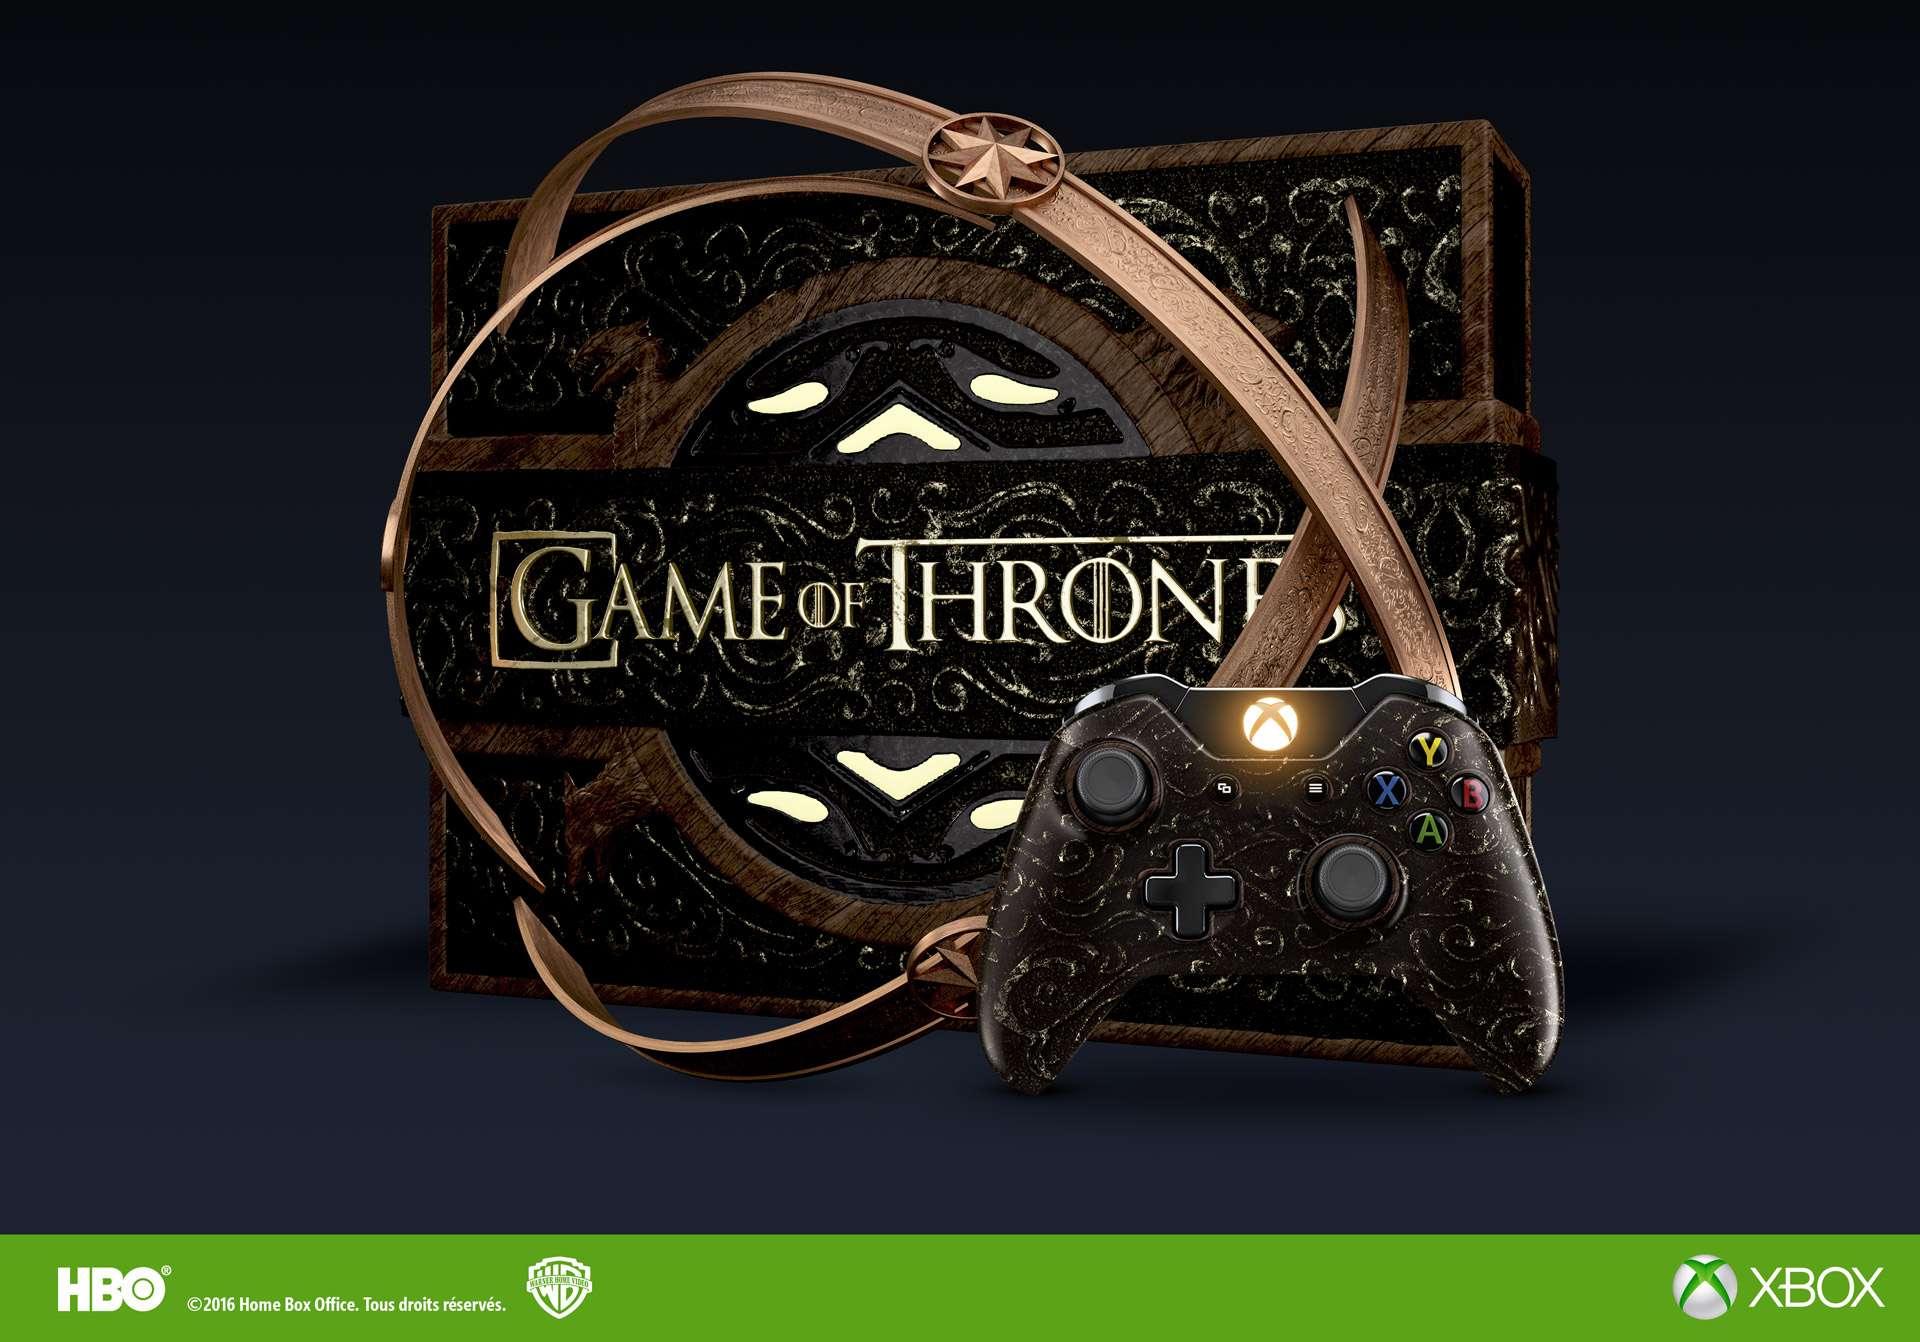 Xbox présente en vidéo la console Xbox One Game Of Thrones Edition ! #XboxLovesYou Cid_5d10